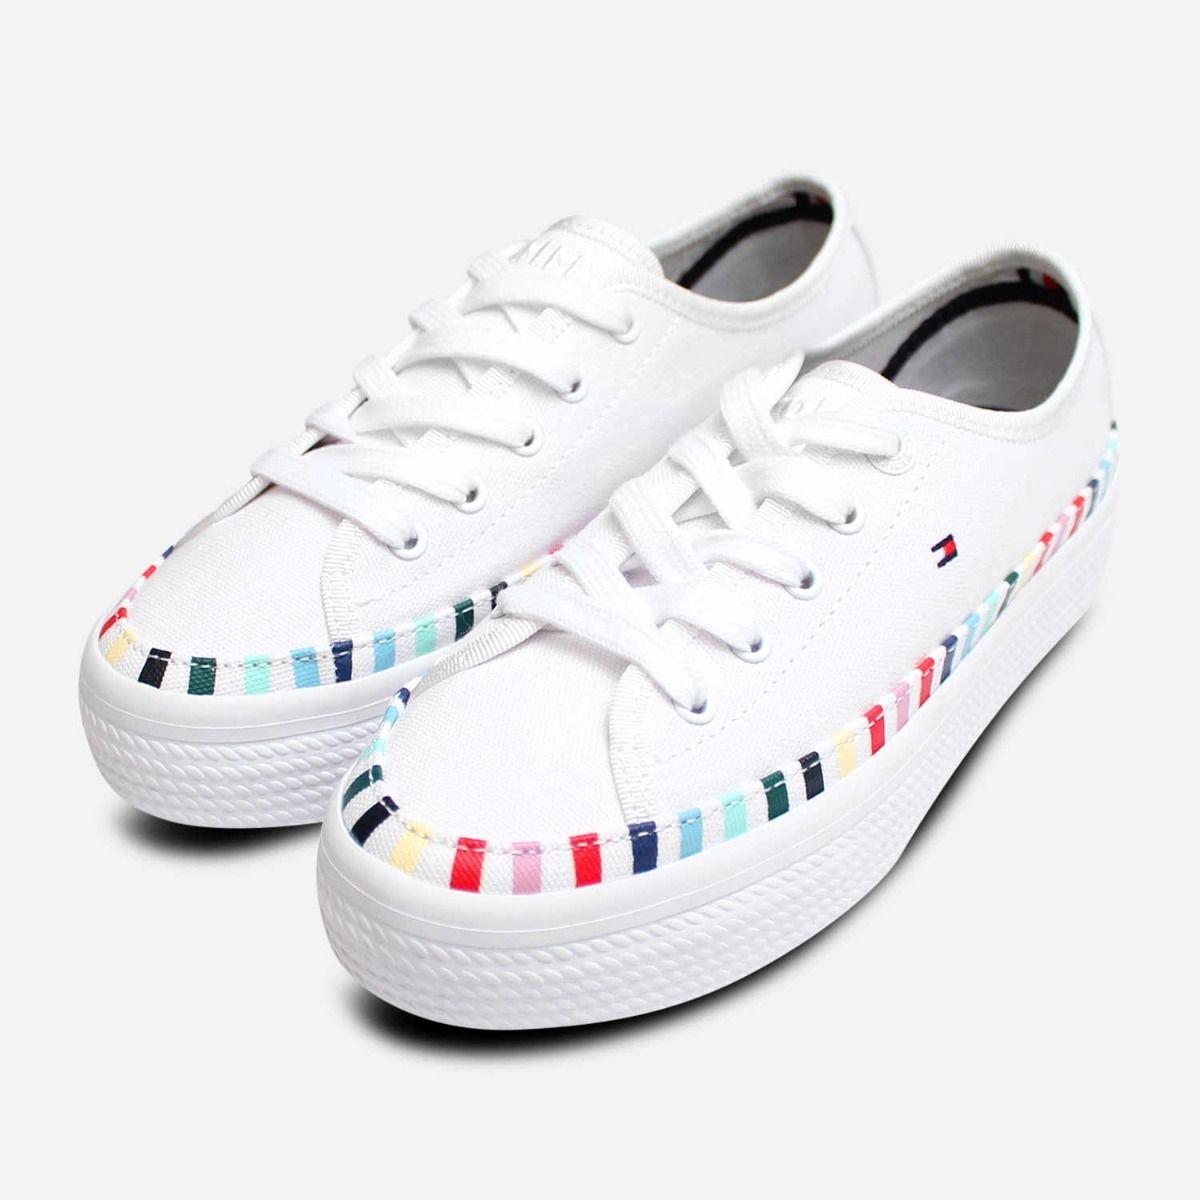 b1f0d993 Tommy Hilfiger Womens Flatform White Rainbow Sneakers